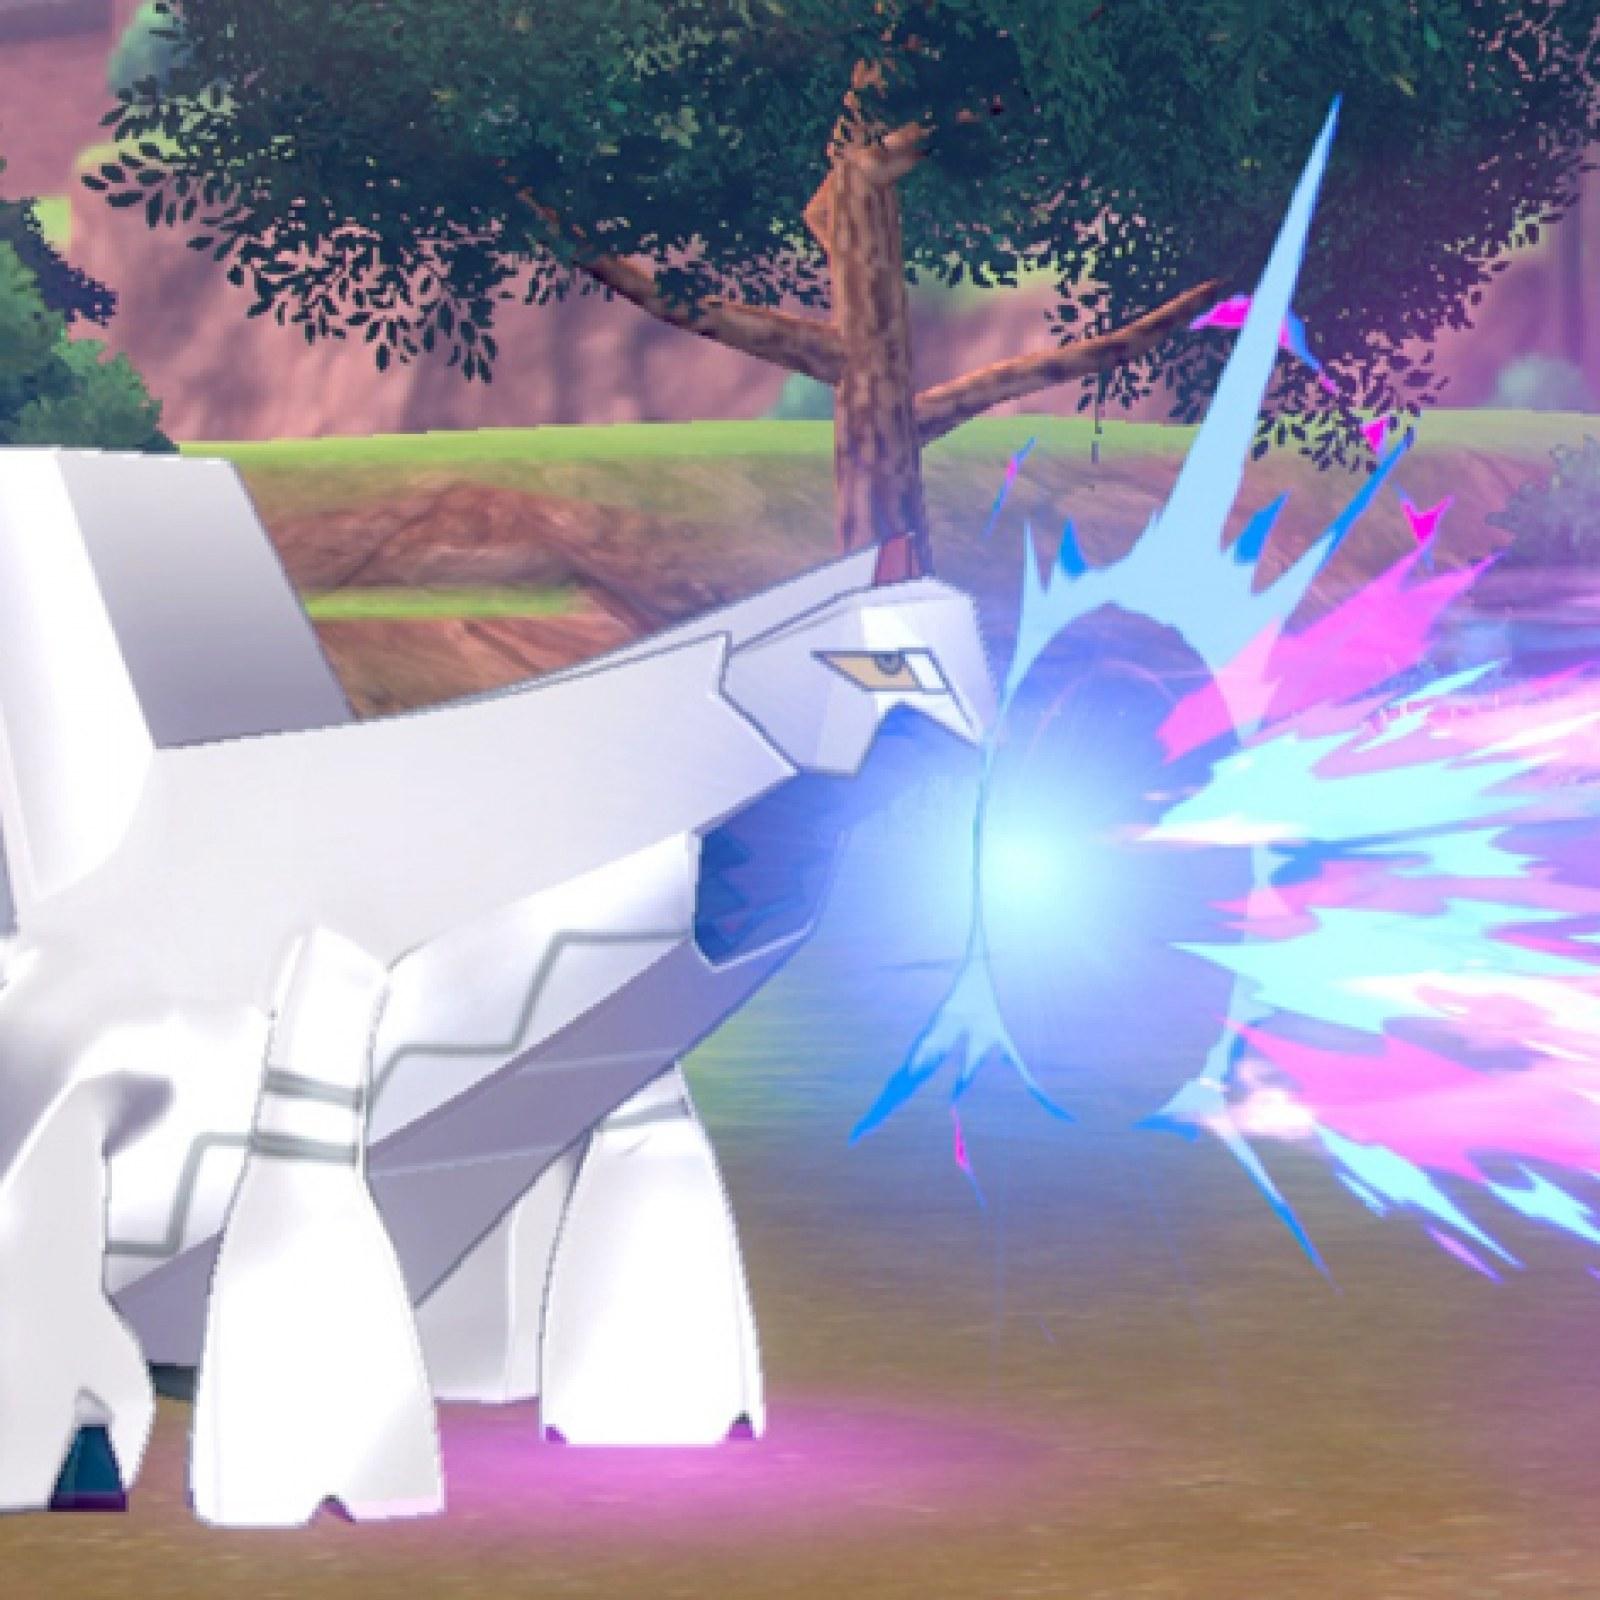 Pokémon Sword and Shield' CoroCoro Leak Reveals Name of New Attack